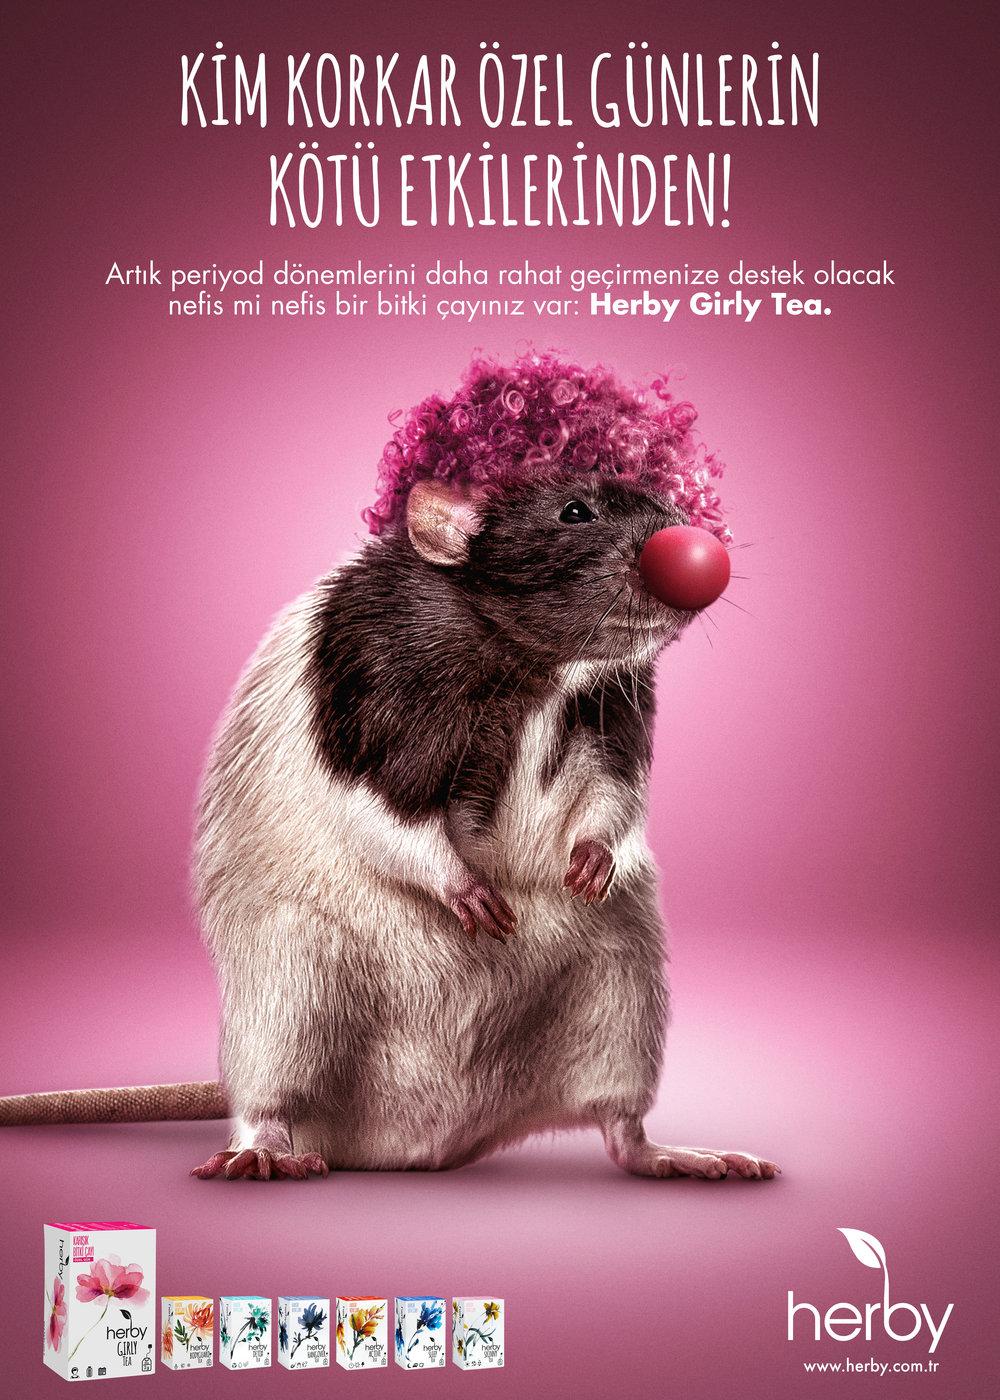 herby-rat.jpg